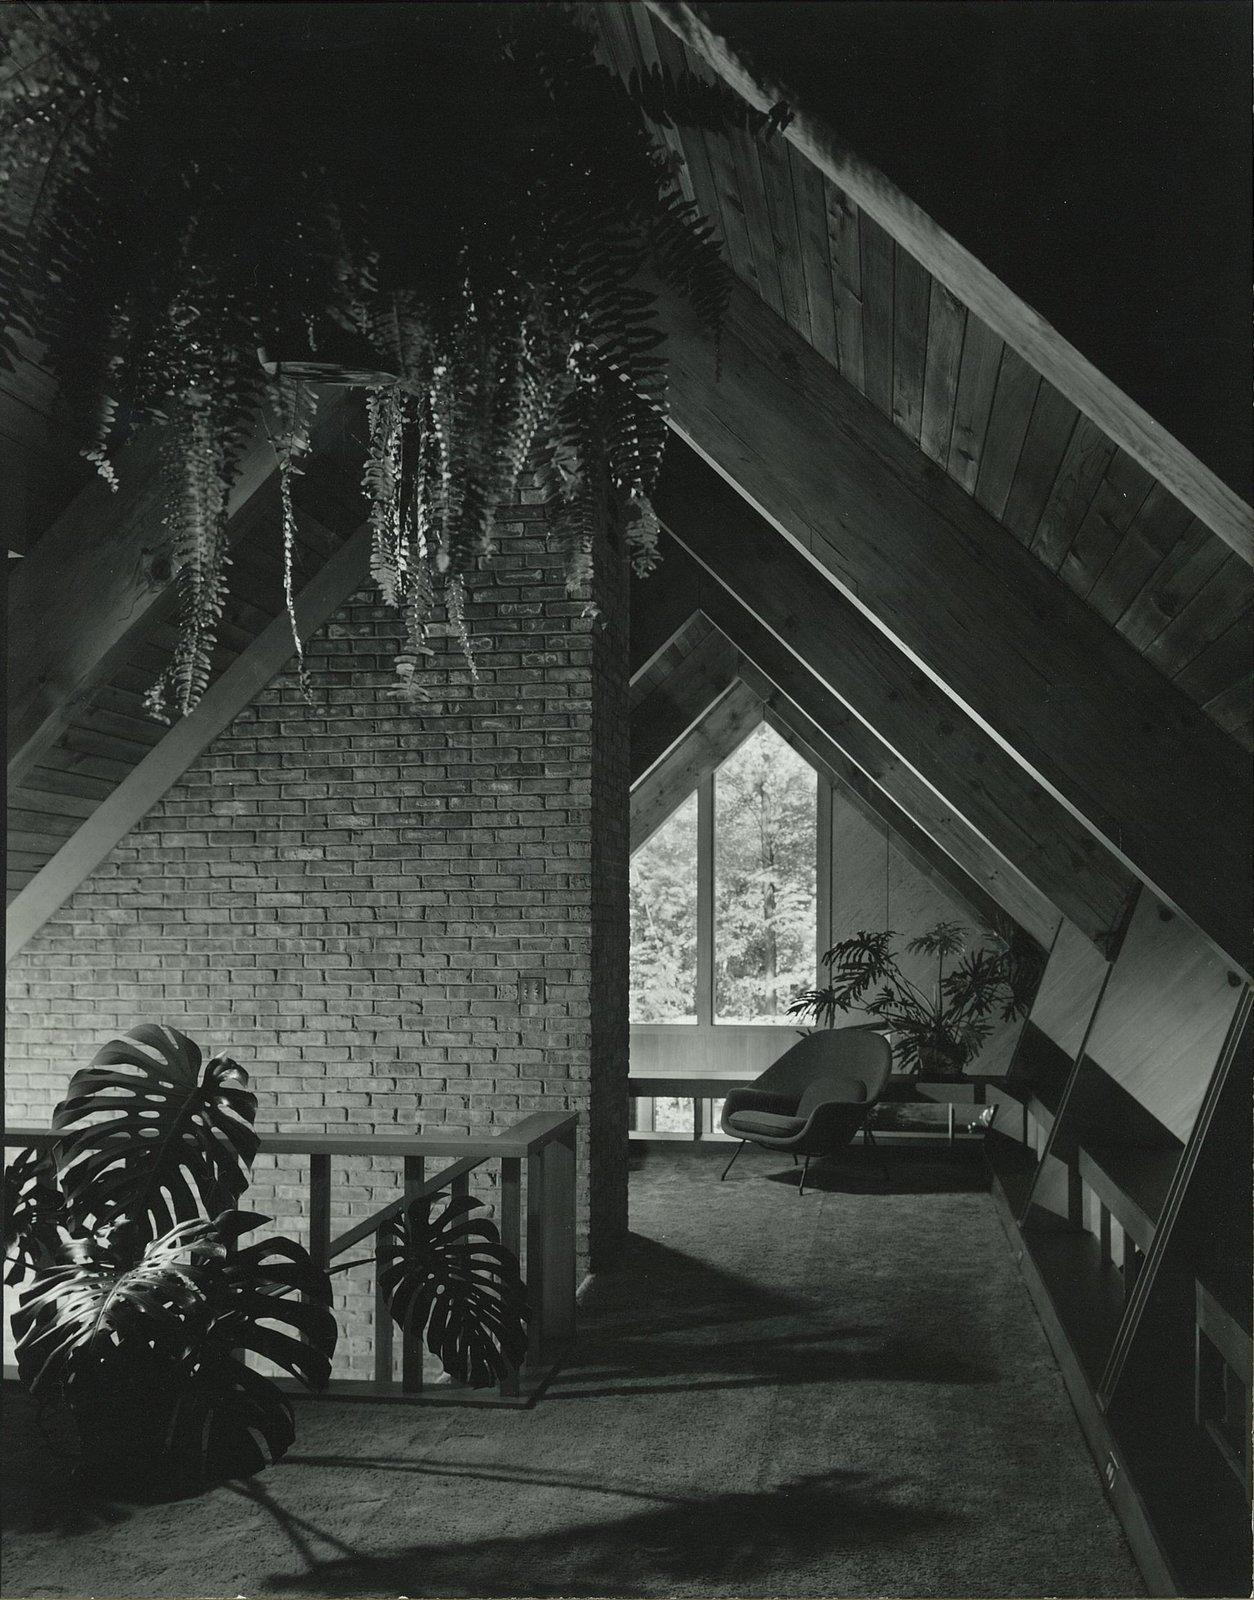 The Josephine Ashmun Residence by Alden B. Dow  The Josephine Ashmun Residence